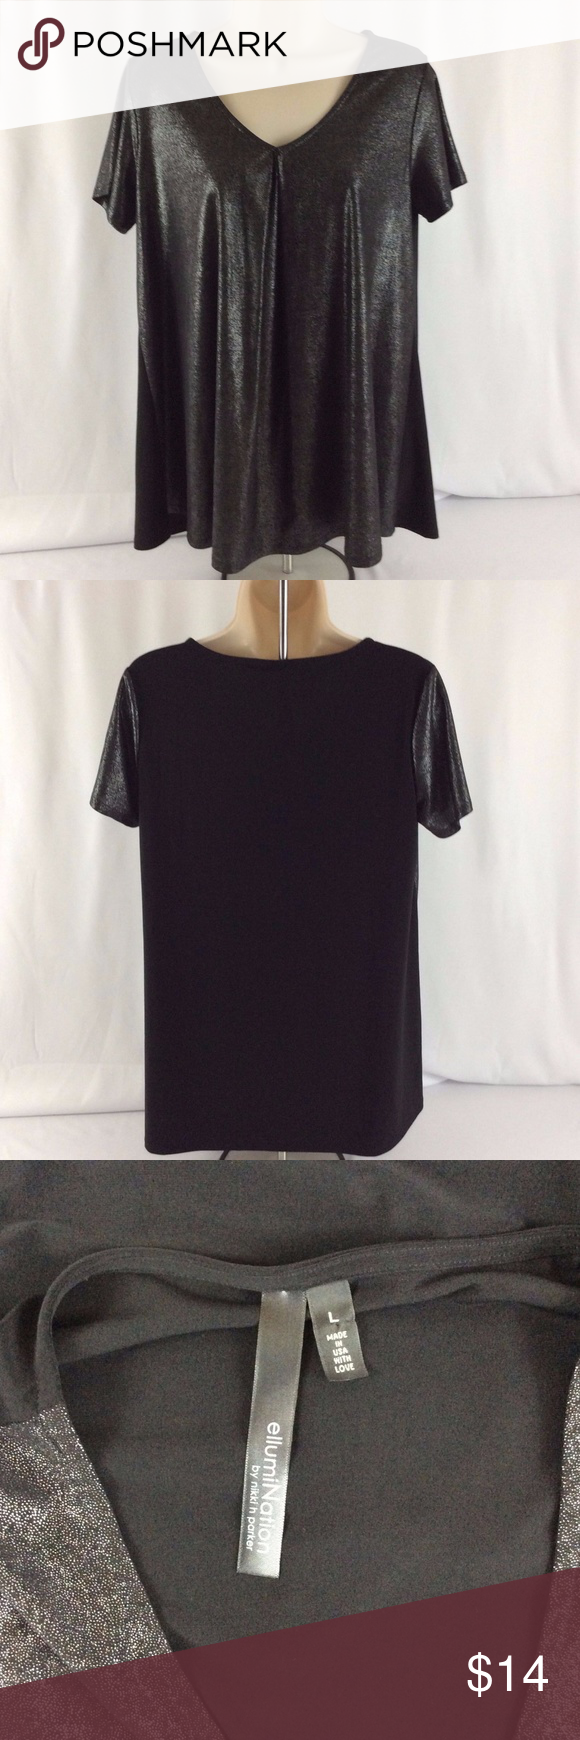 ec35172a3 EllumiNation Nikki H Parker Black Shimmer Shirt EllumiNation Nikki H Parker  Black Silver Shimmer Shirt Blouse Large Womens Loose Fit.